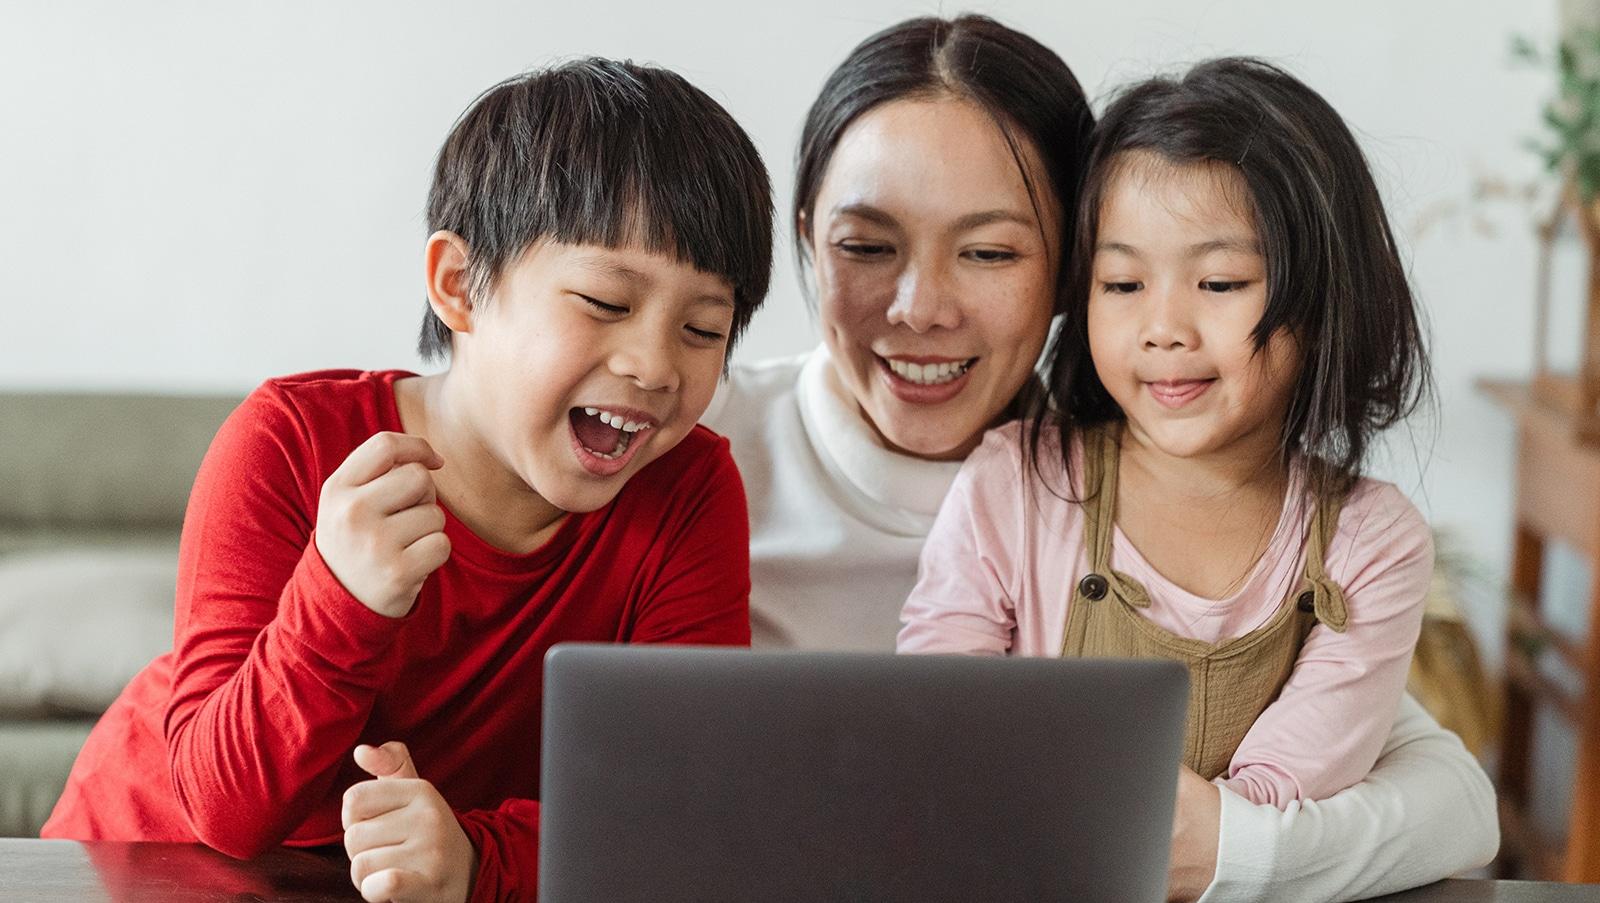 Nurture Social Skills and Make E Learning Fun at Home